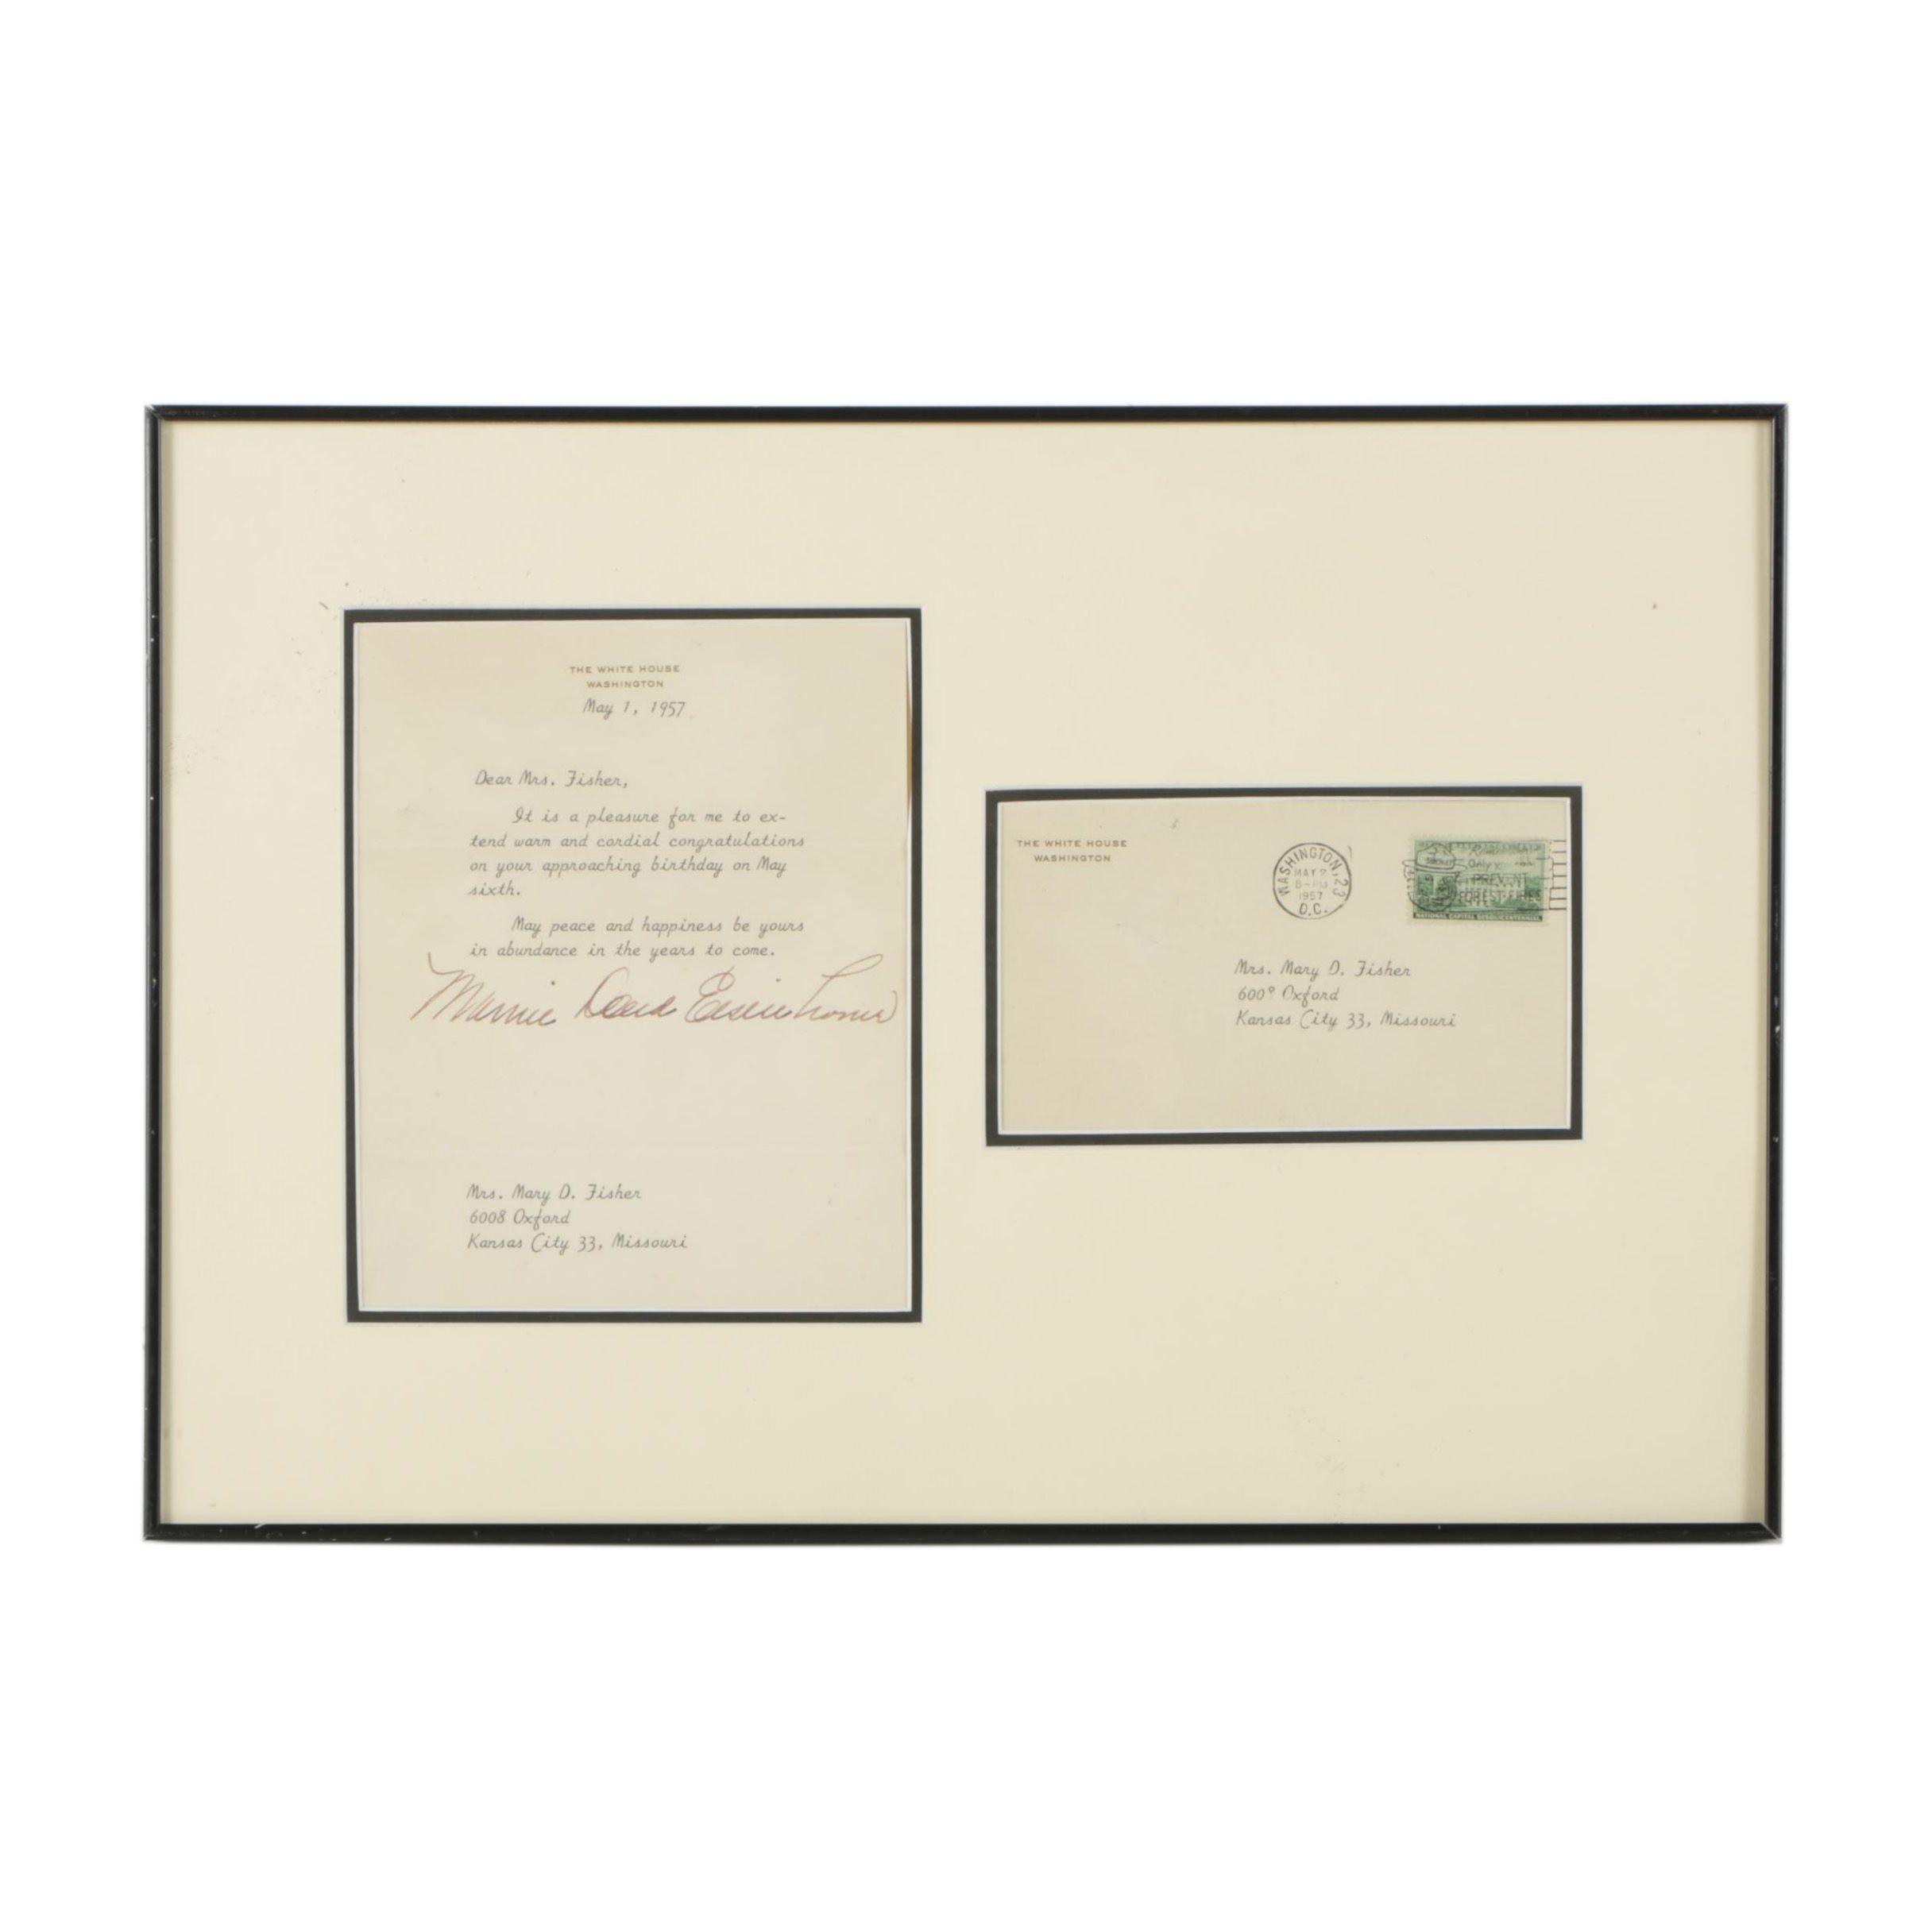 Signed Letter from Mamie Eisenhower in Framed Display